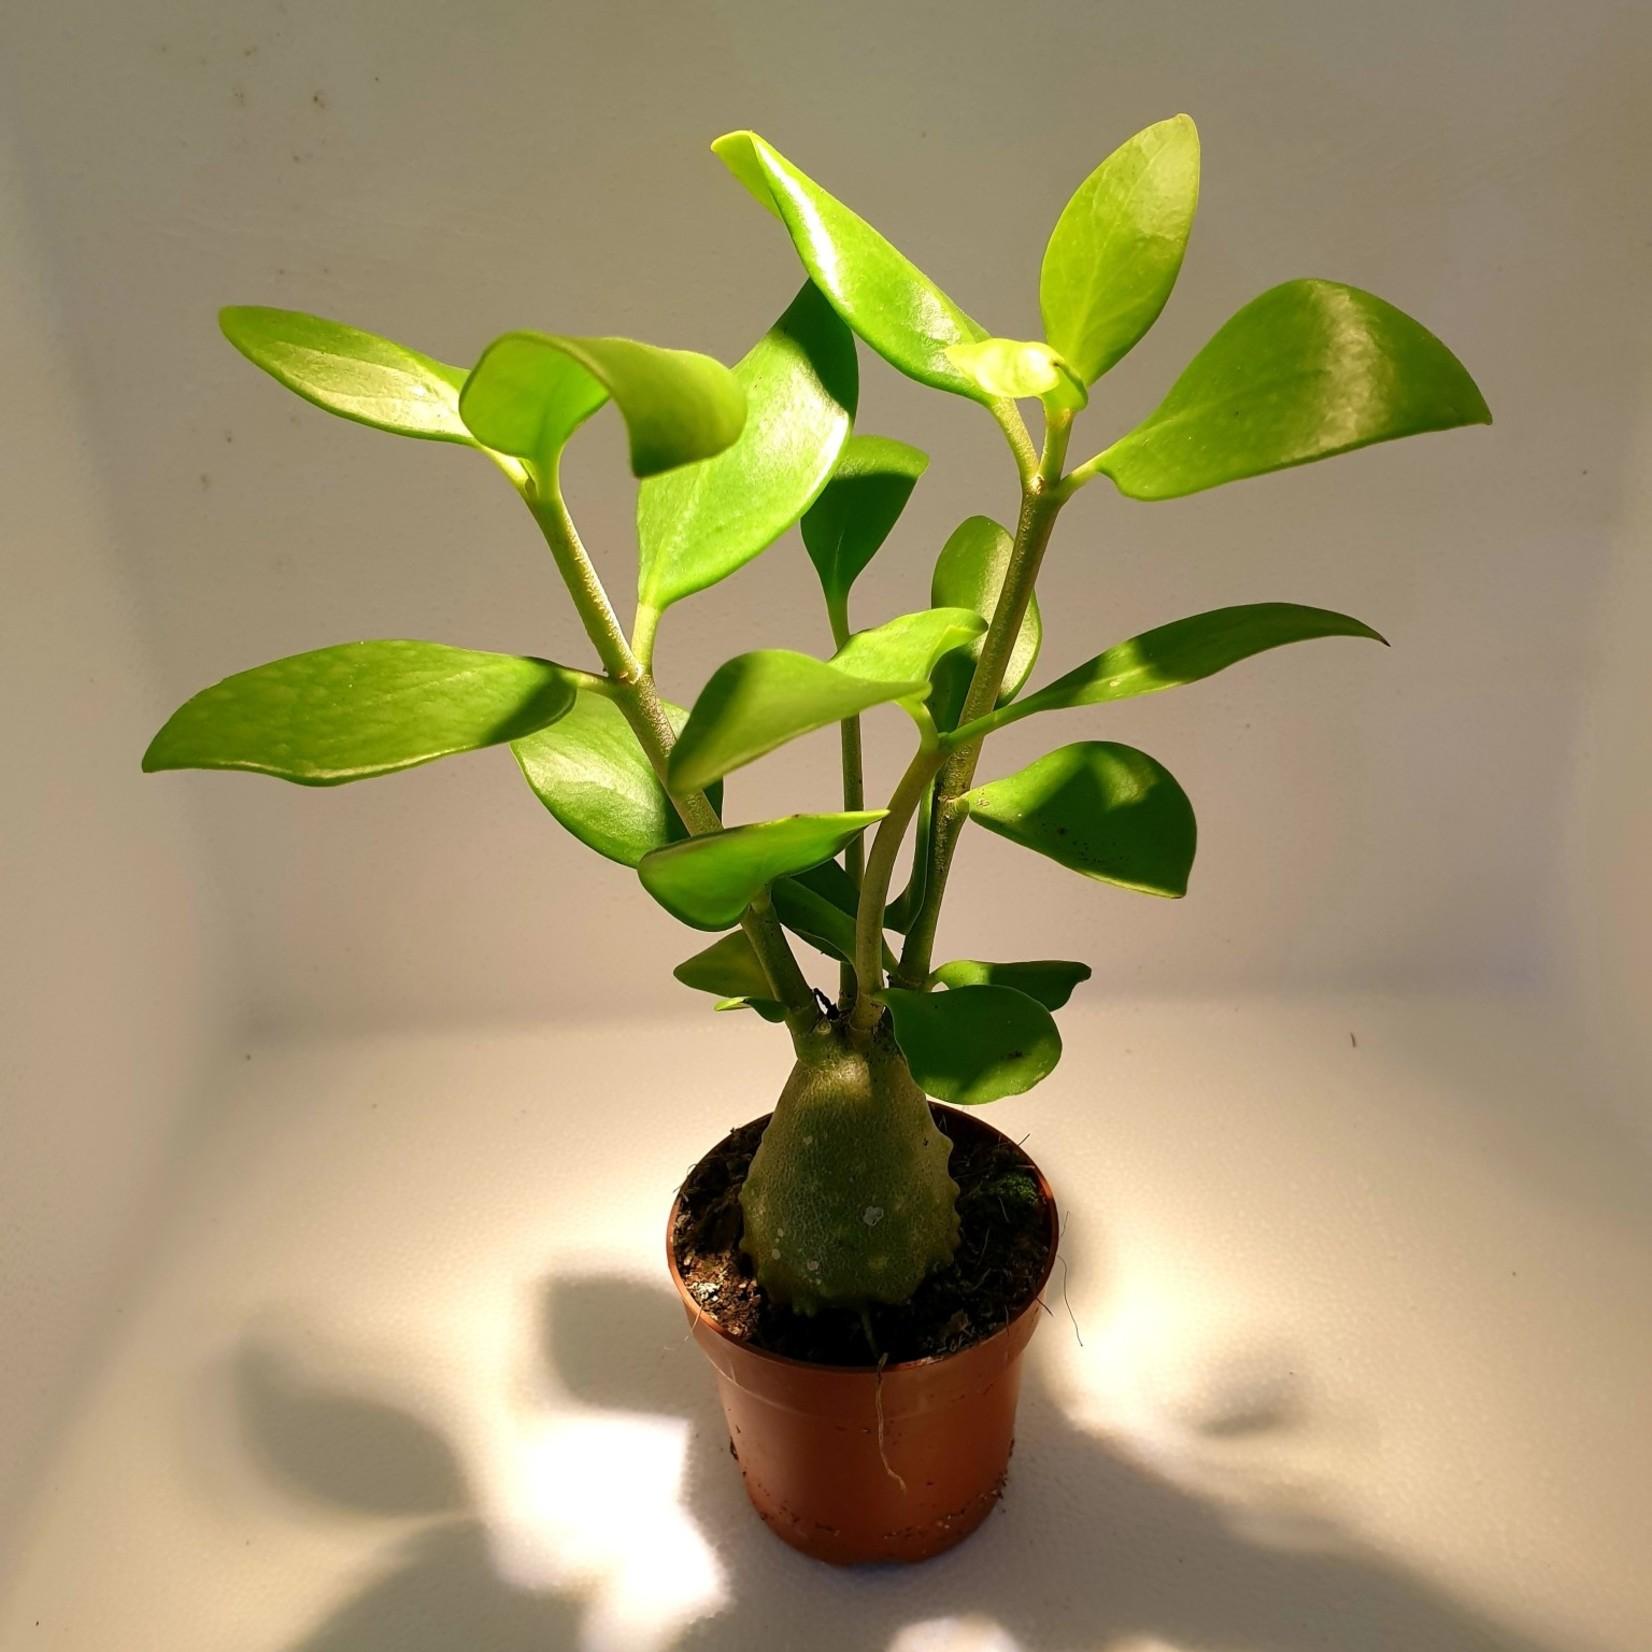 NLS Myrmecophytic plant - Hydnophytum papuanum